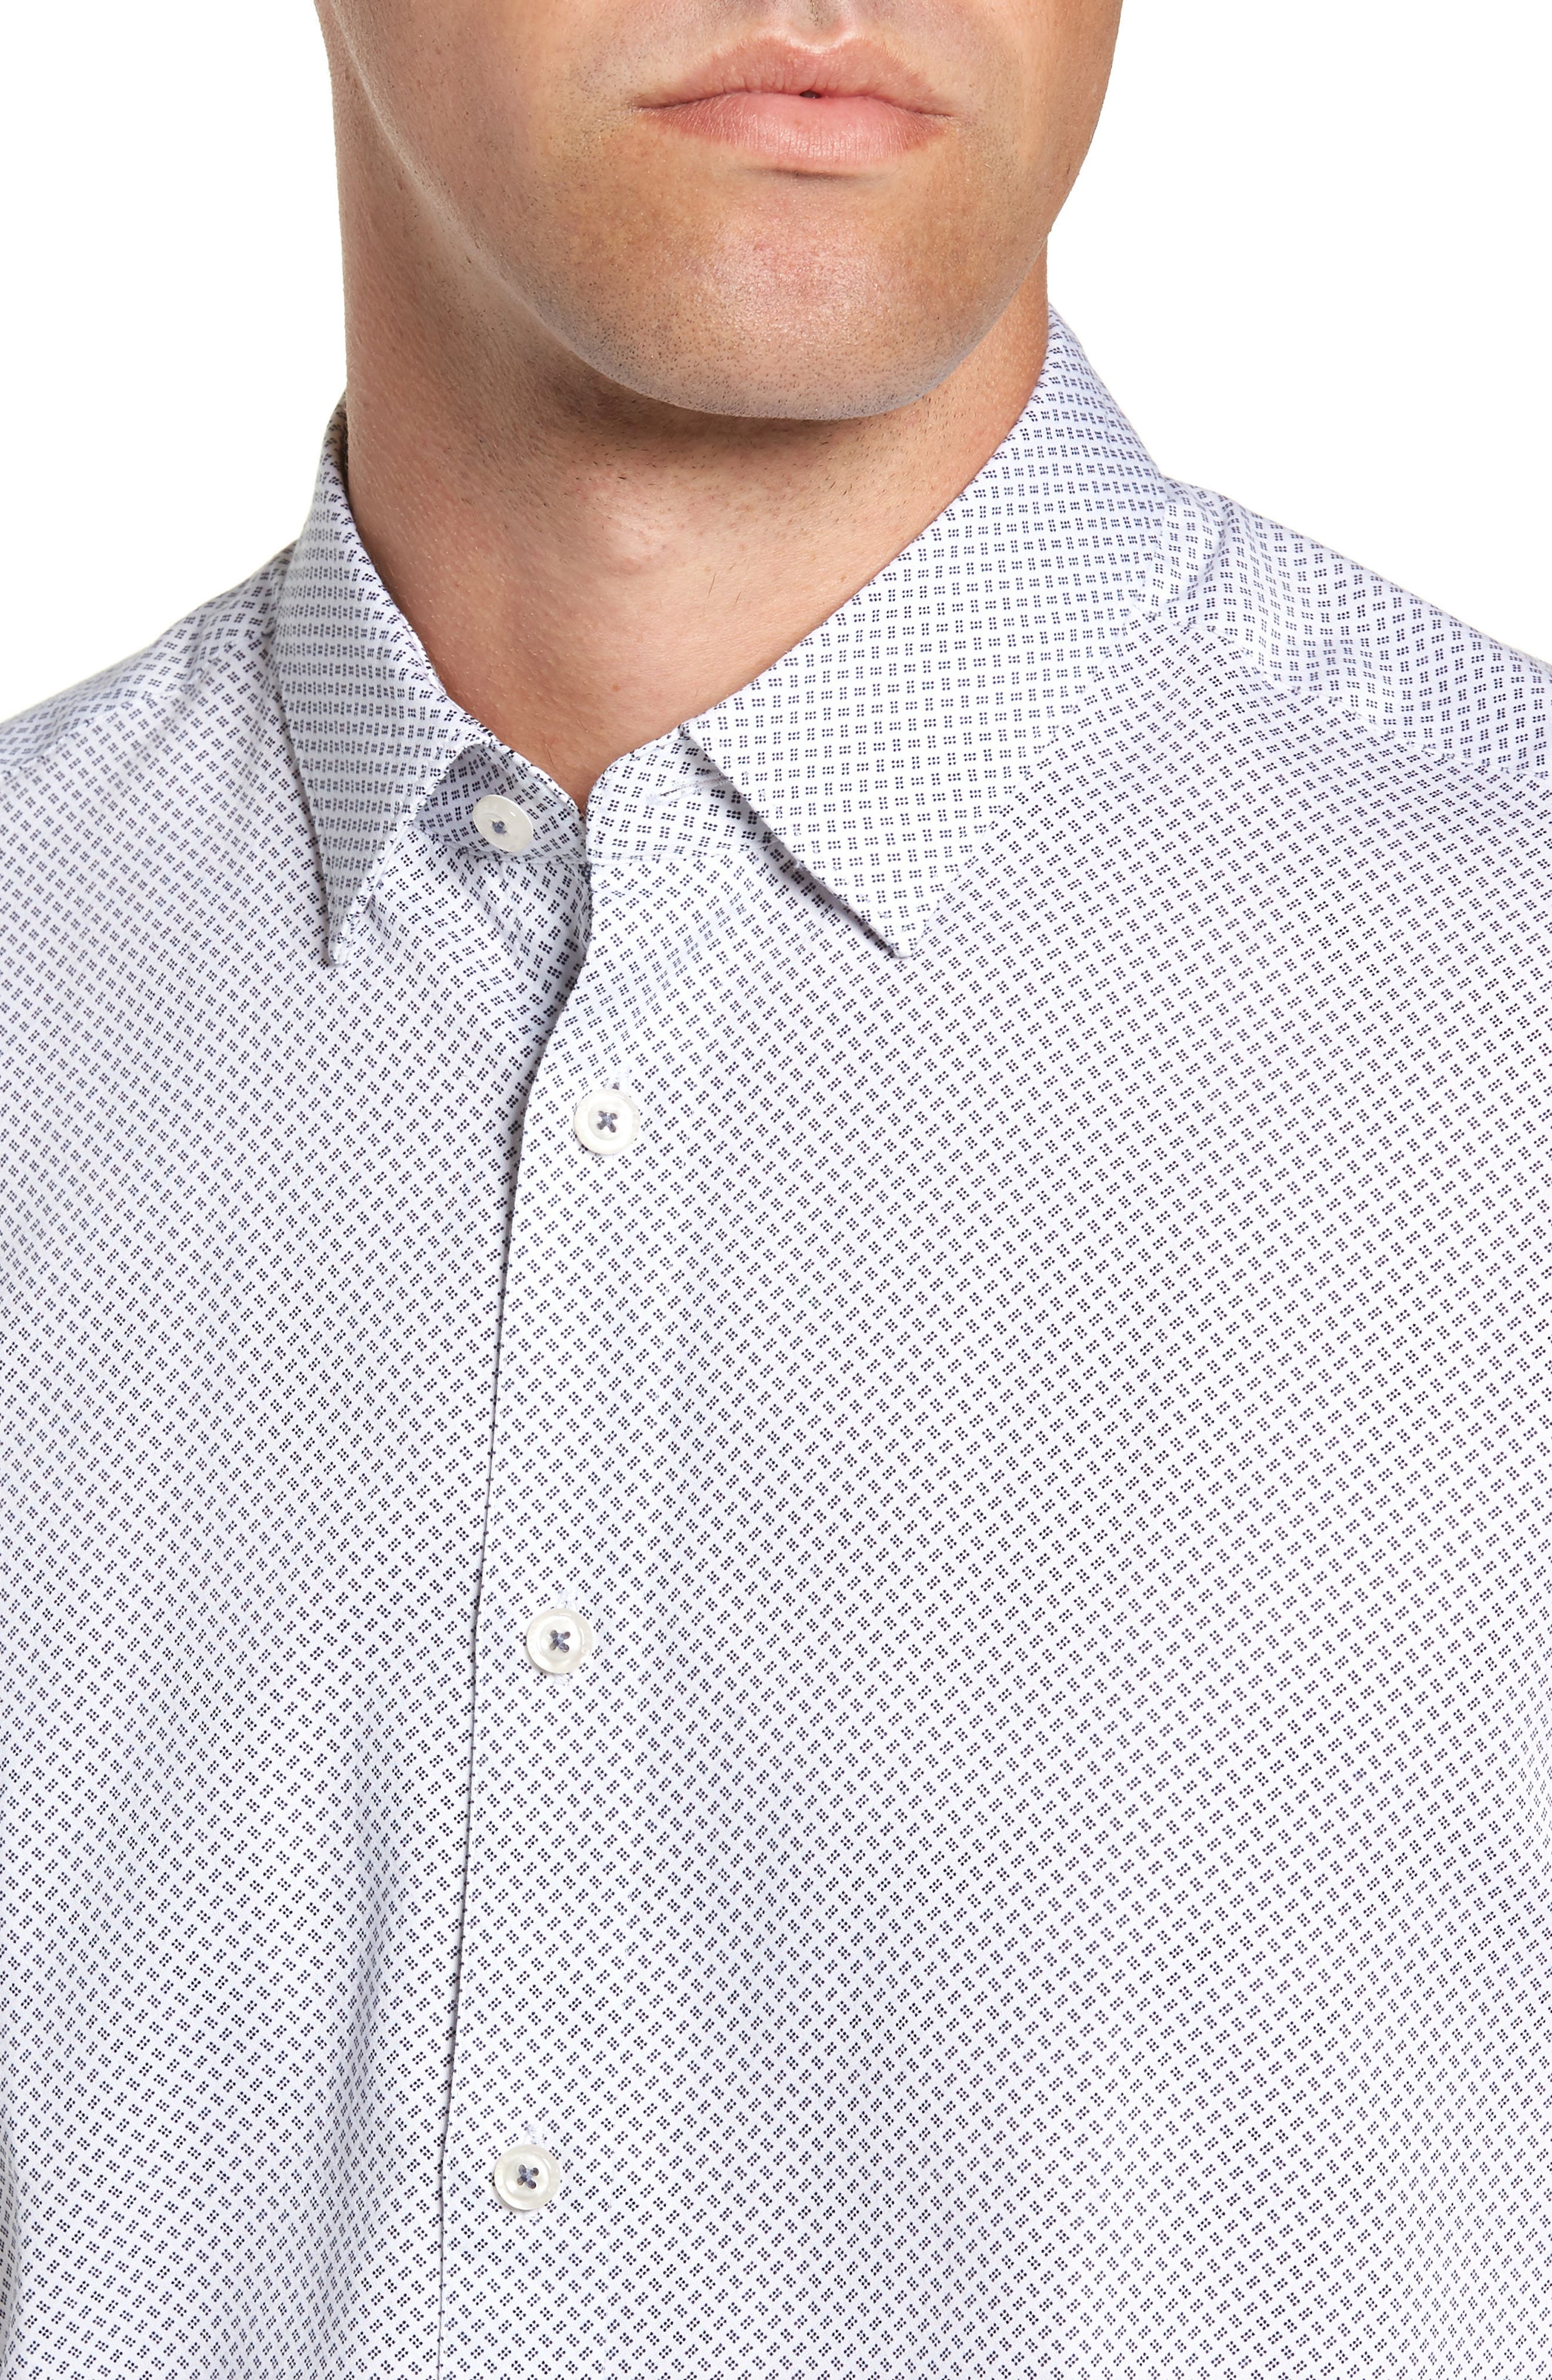 Aspara Modern Fit Geometric Dress Shirt,                             Alternate thumbnail 2, color,                             WHITE/ NAVY